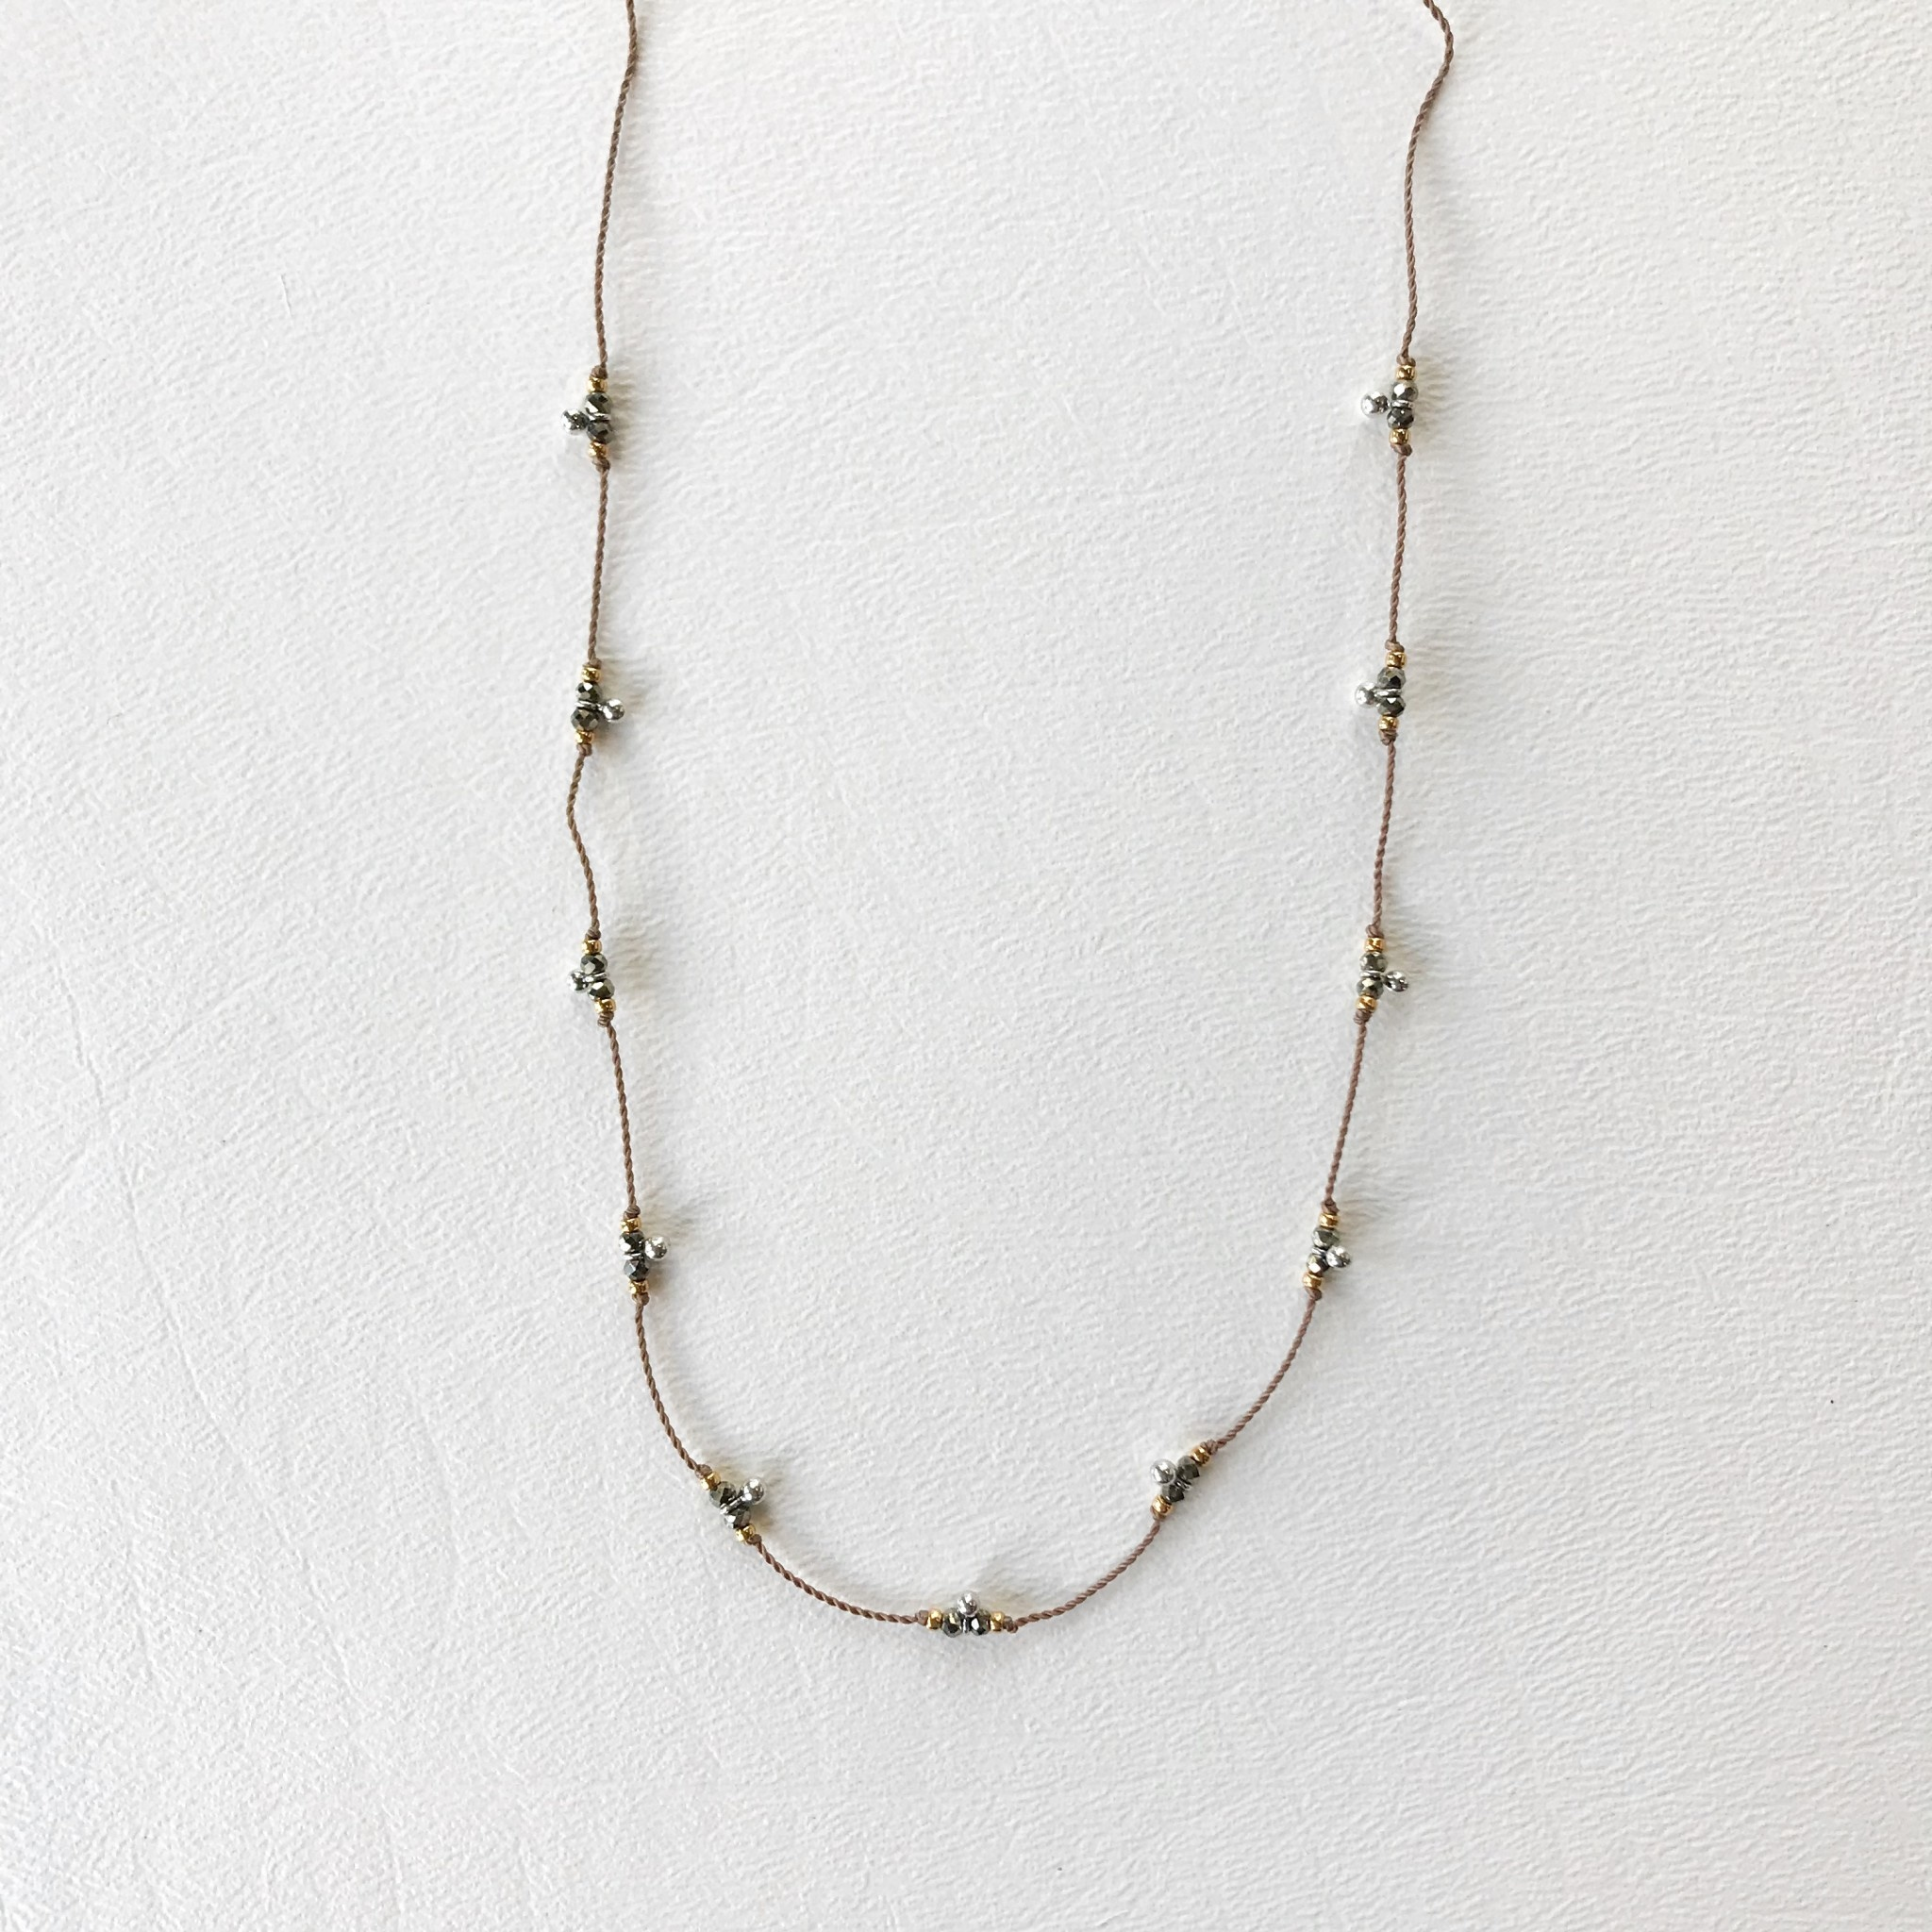 Pyrite trail necklace